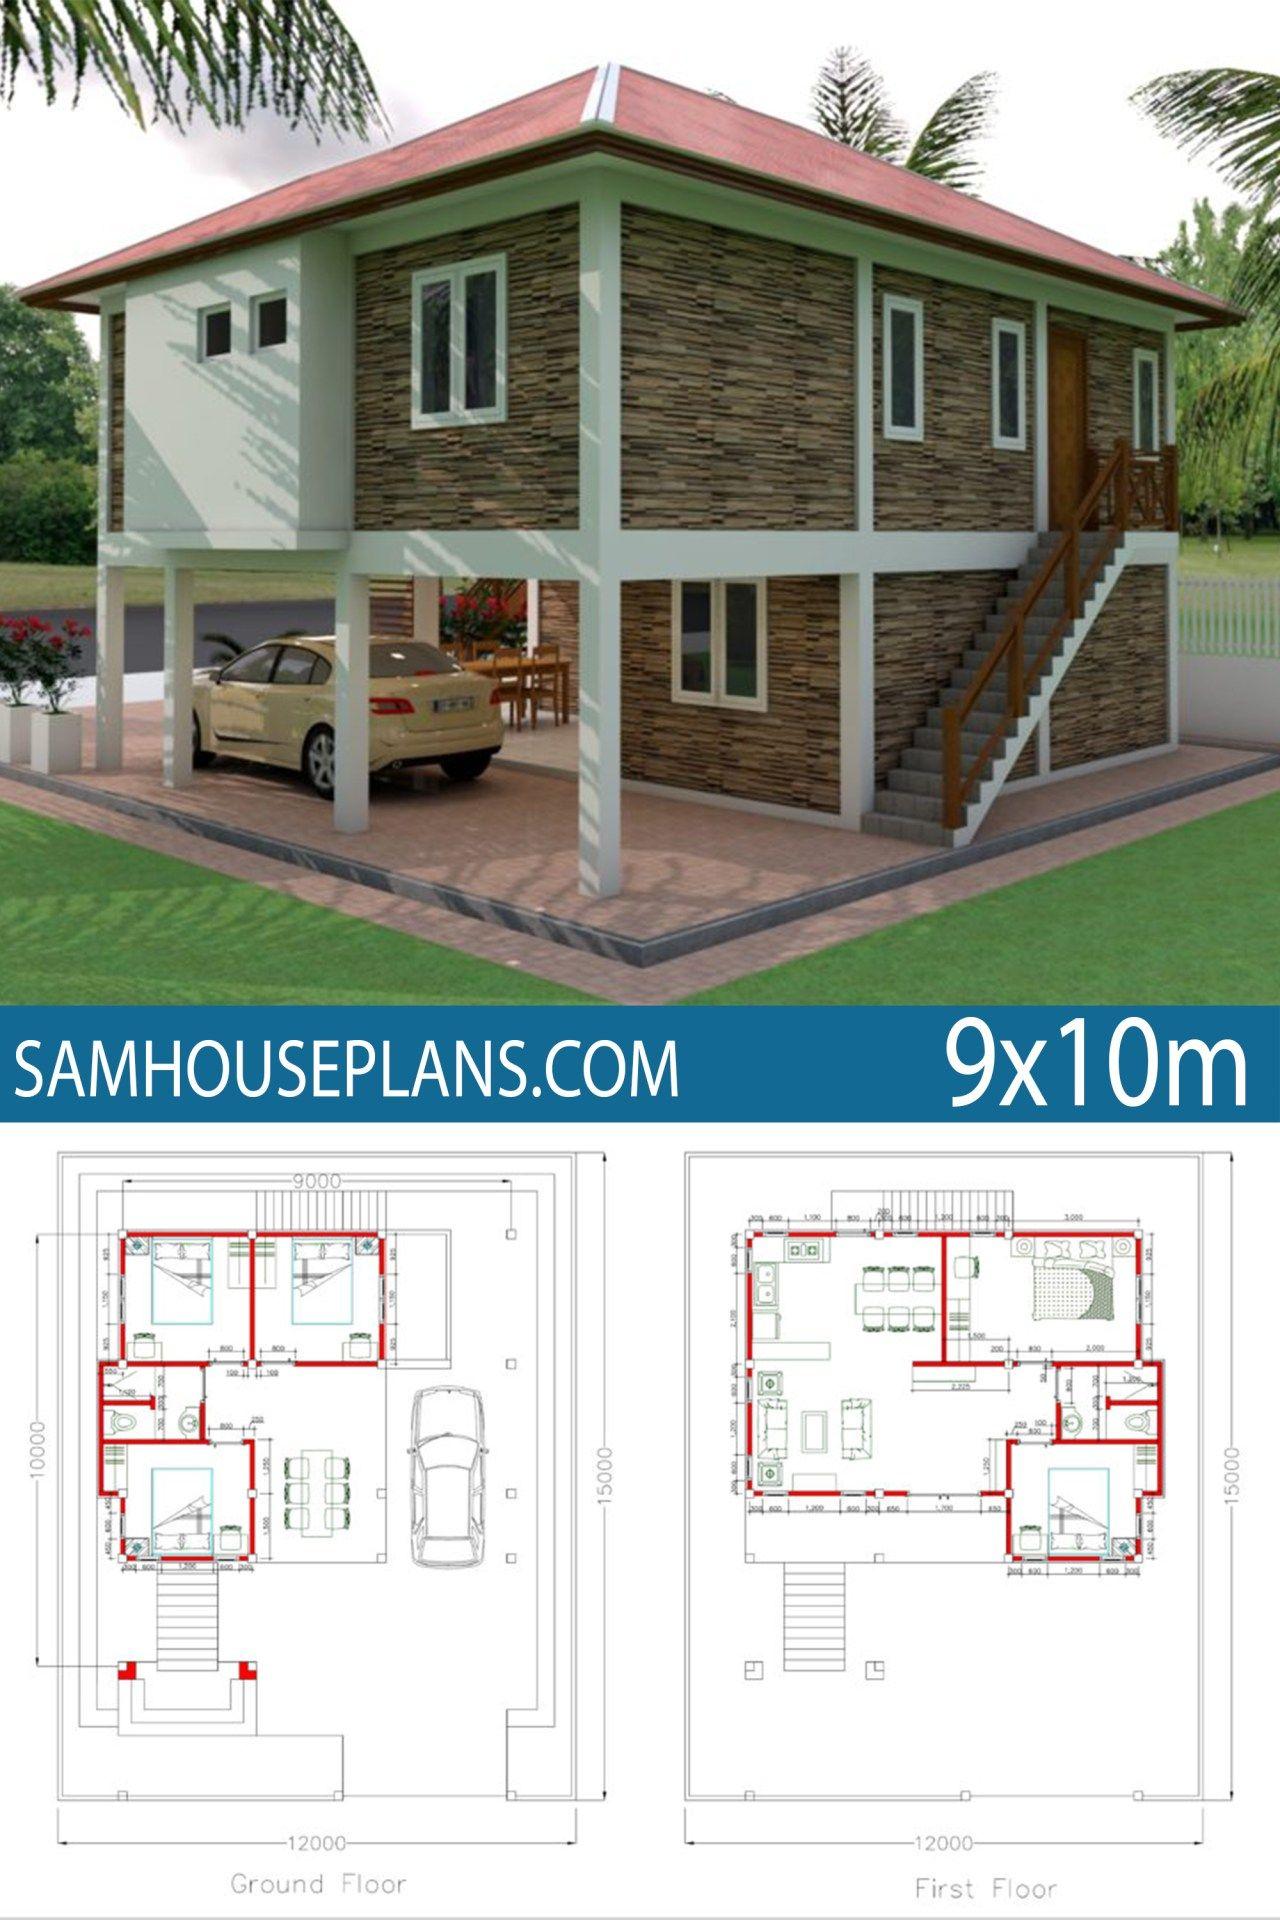 Home Design Plan 9x10m 5 Bedrooms Sam House Plans House Design Model House Plan House Plans